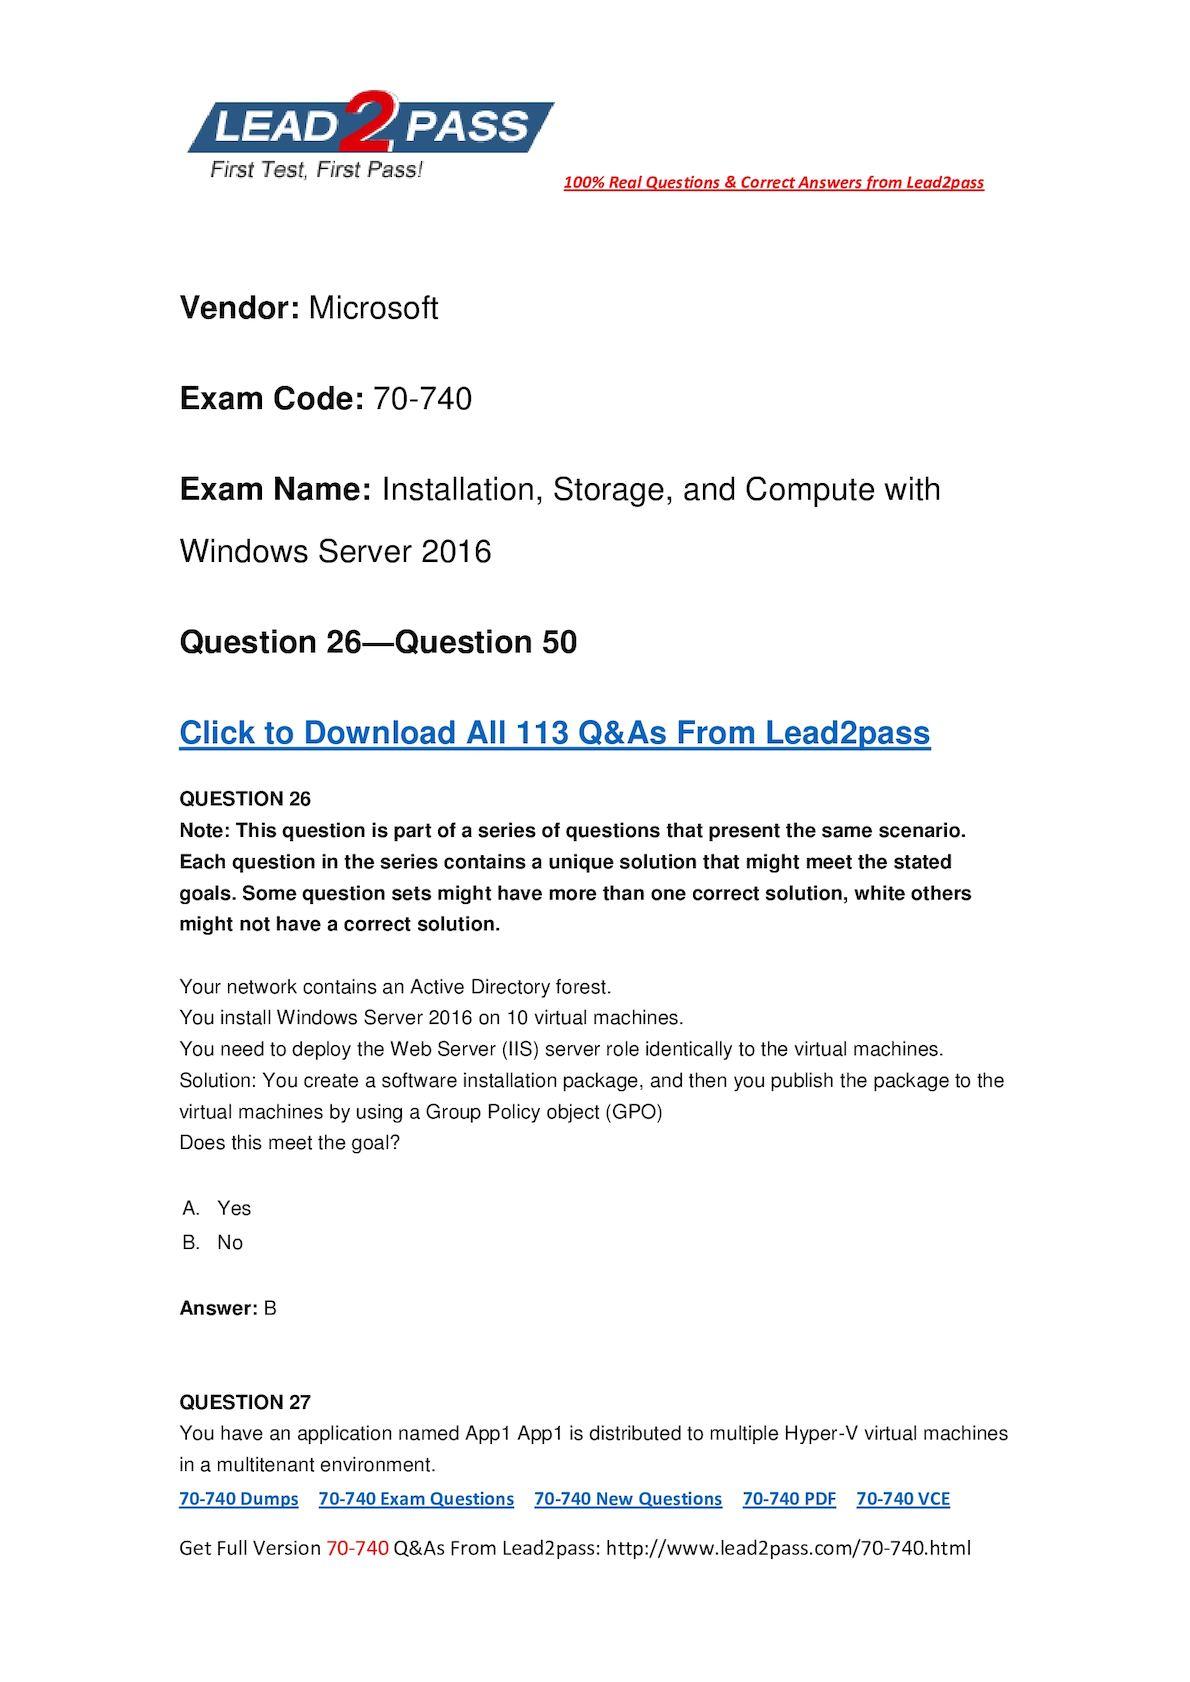 [Full Version] 70-740 PDF Dump Free Download In Lead2pass (26-50)